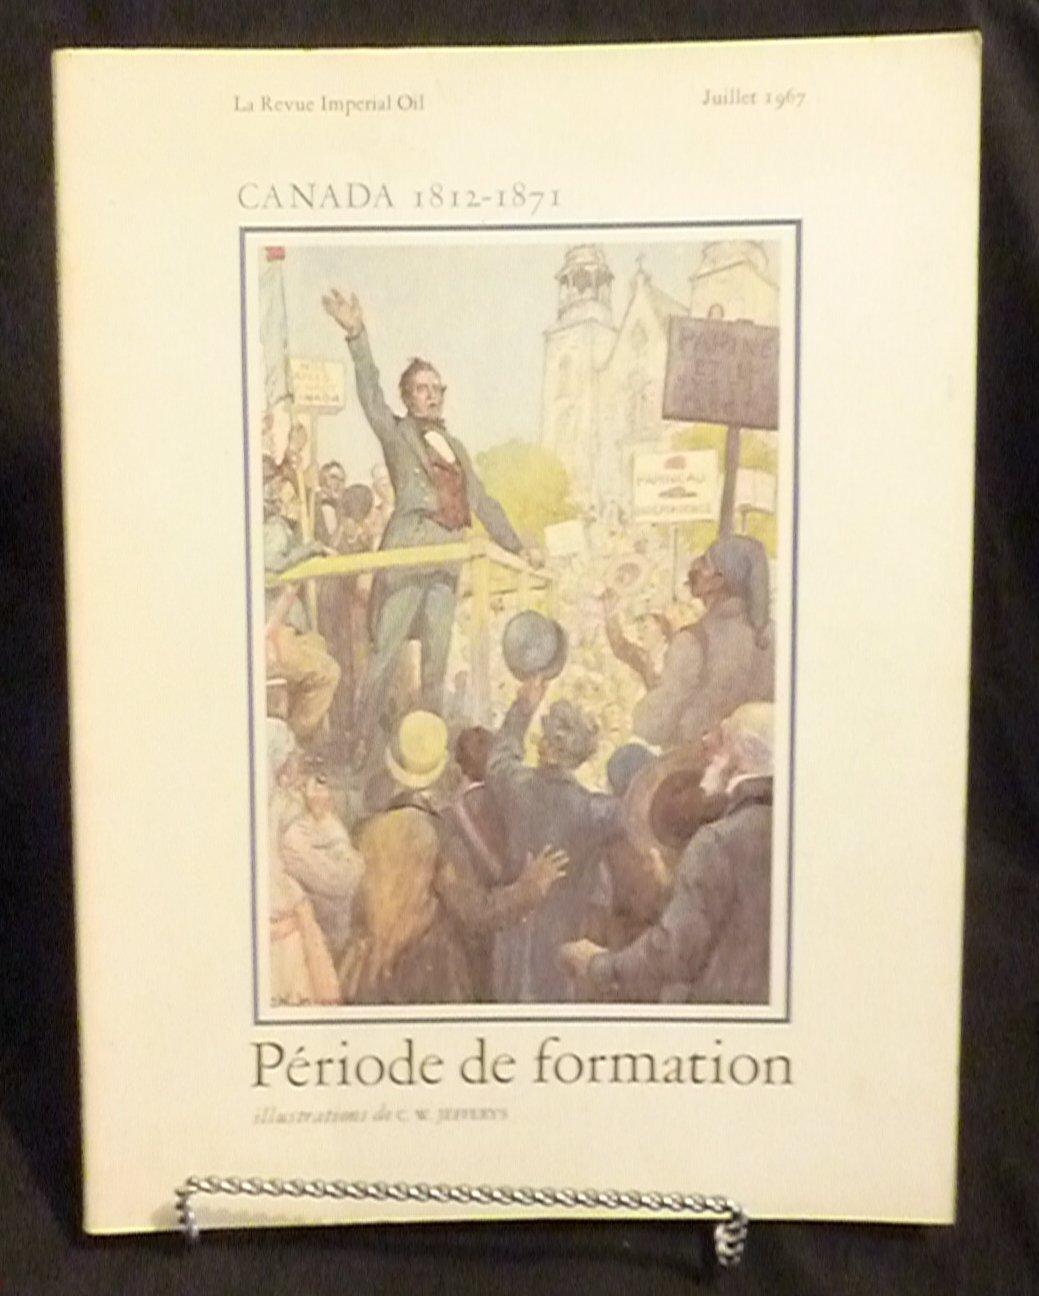 Periode de formation - La Revue Imperial Oil